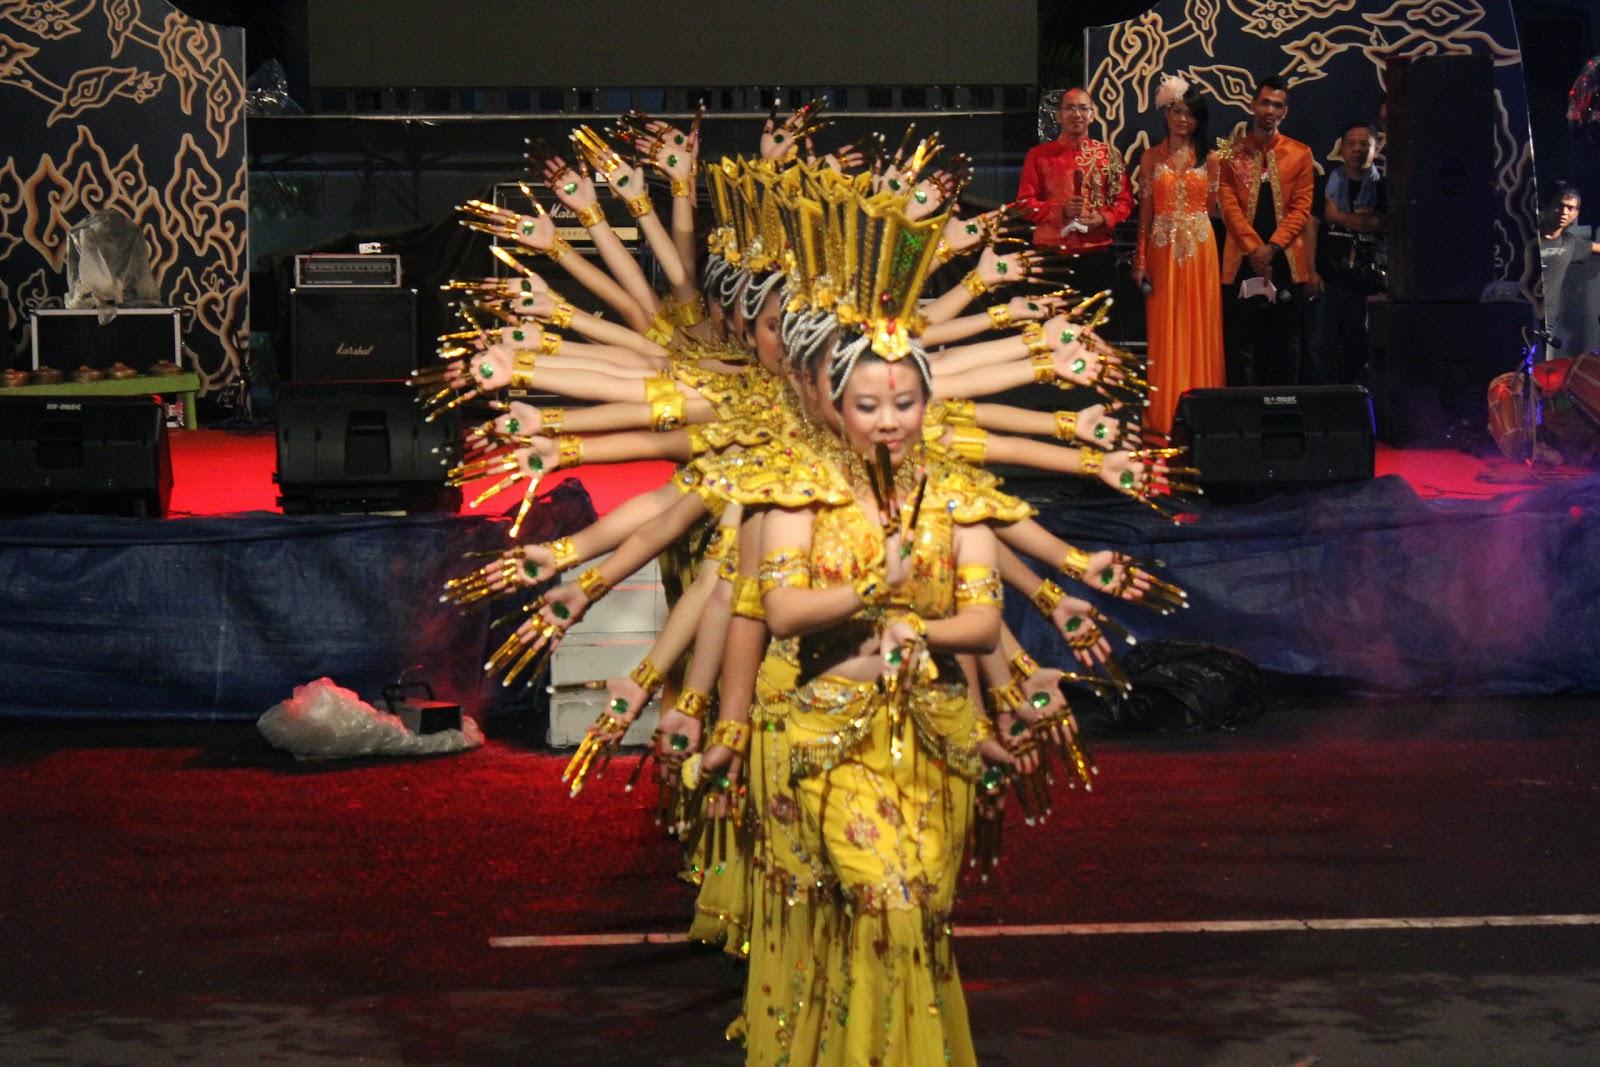 Bintang Asia Promosindo | Event Organizer | EO